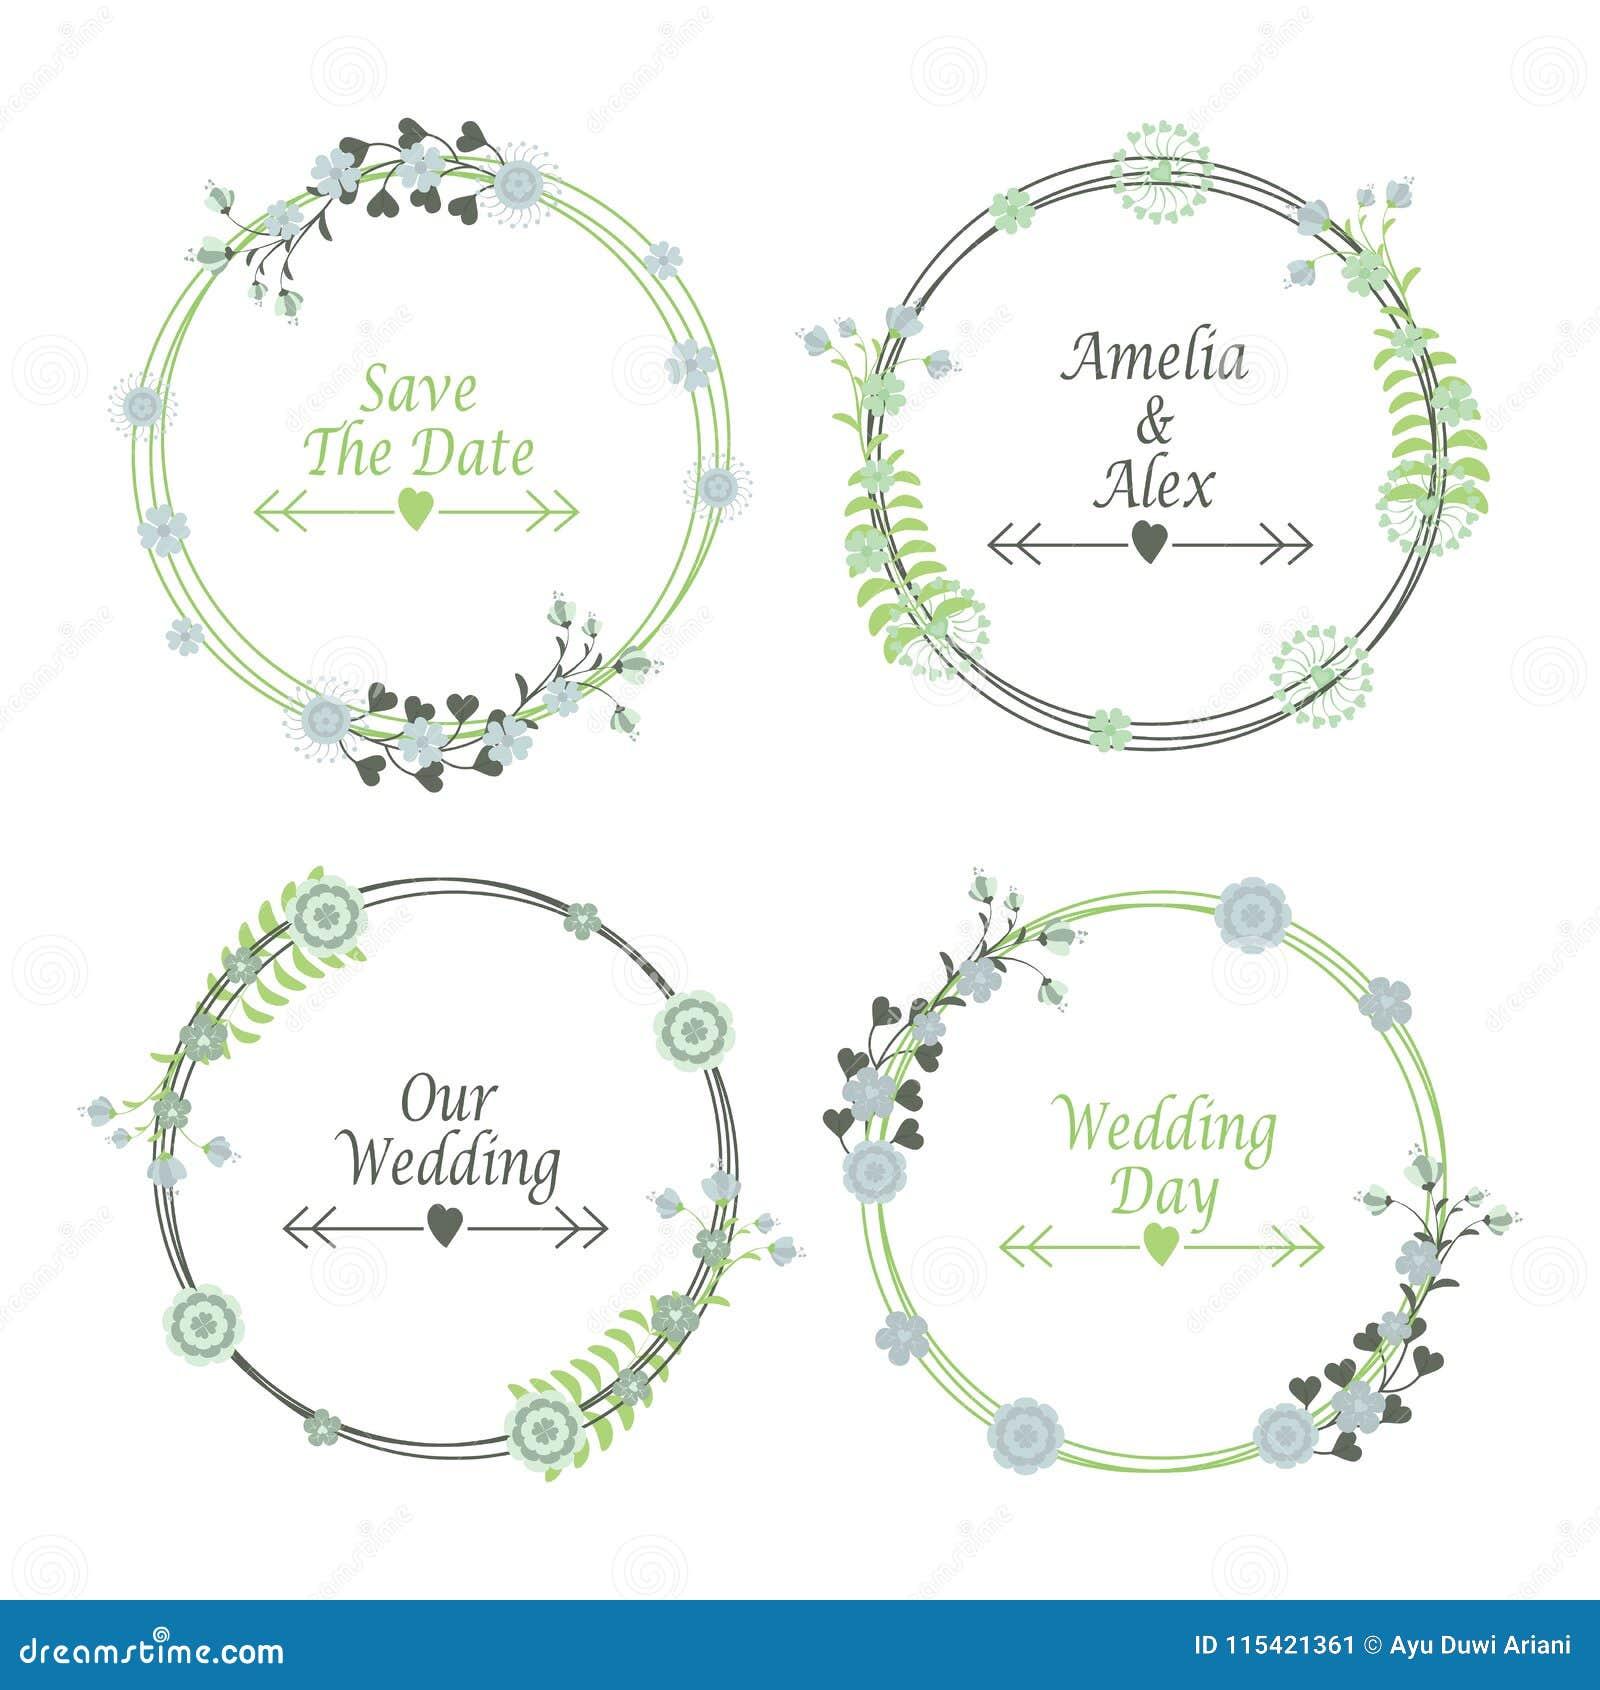 wedding sticker design template - Ataum berglauf-verband com